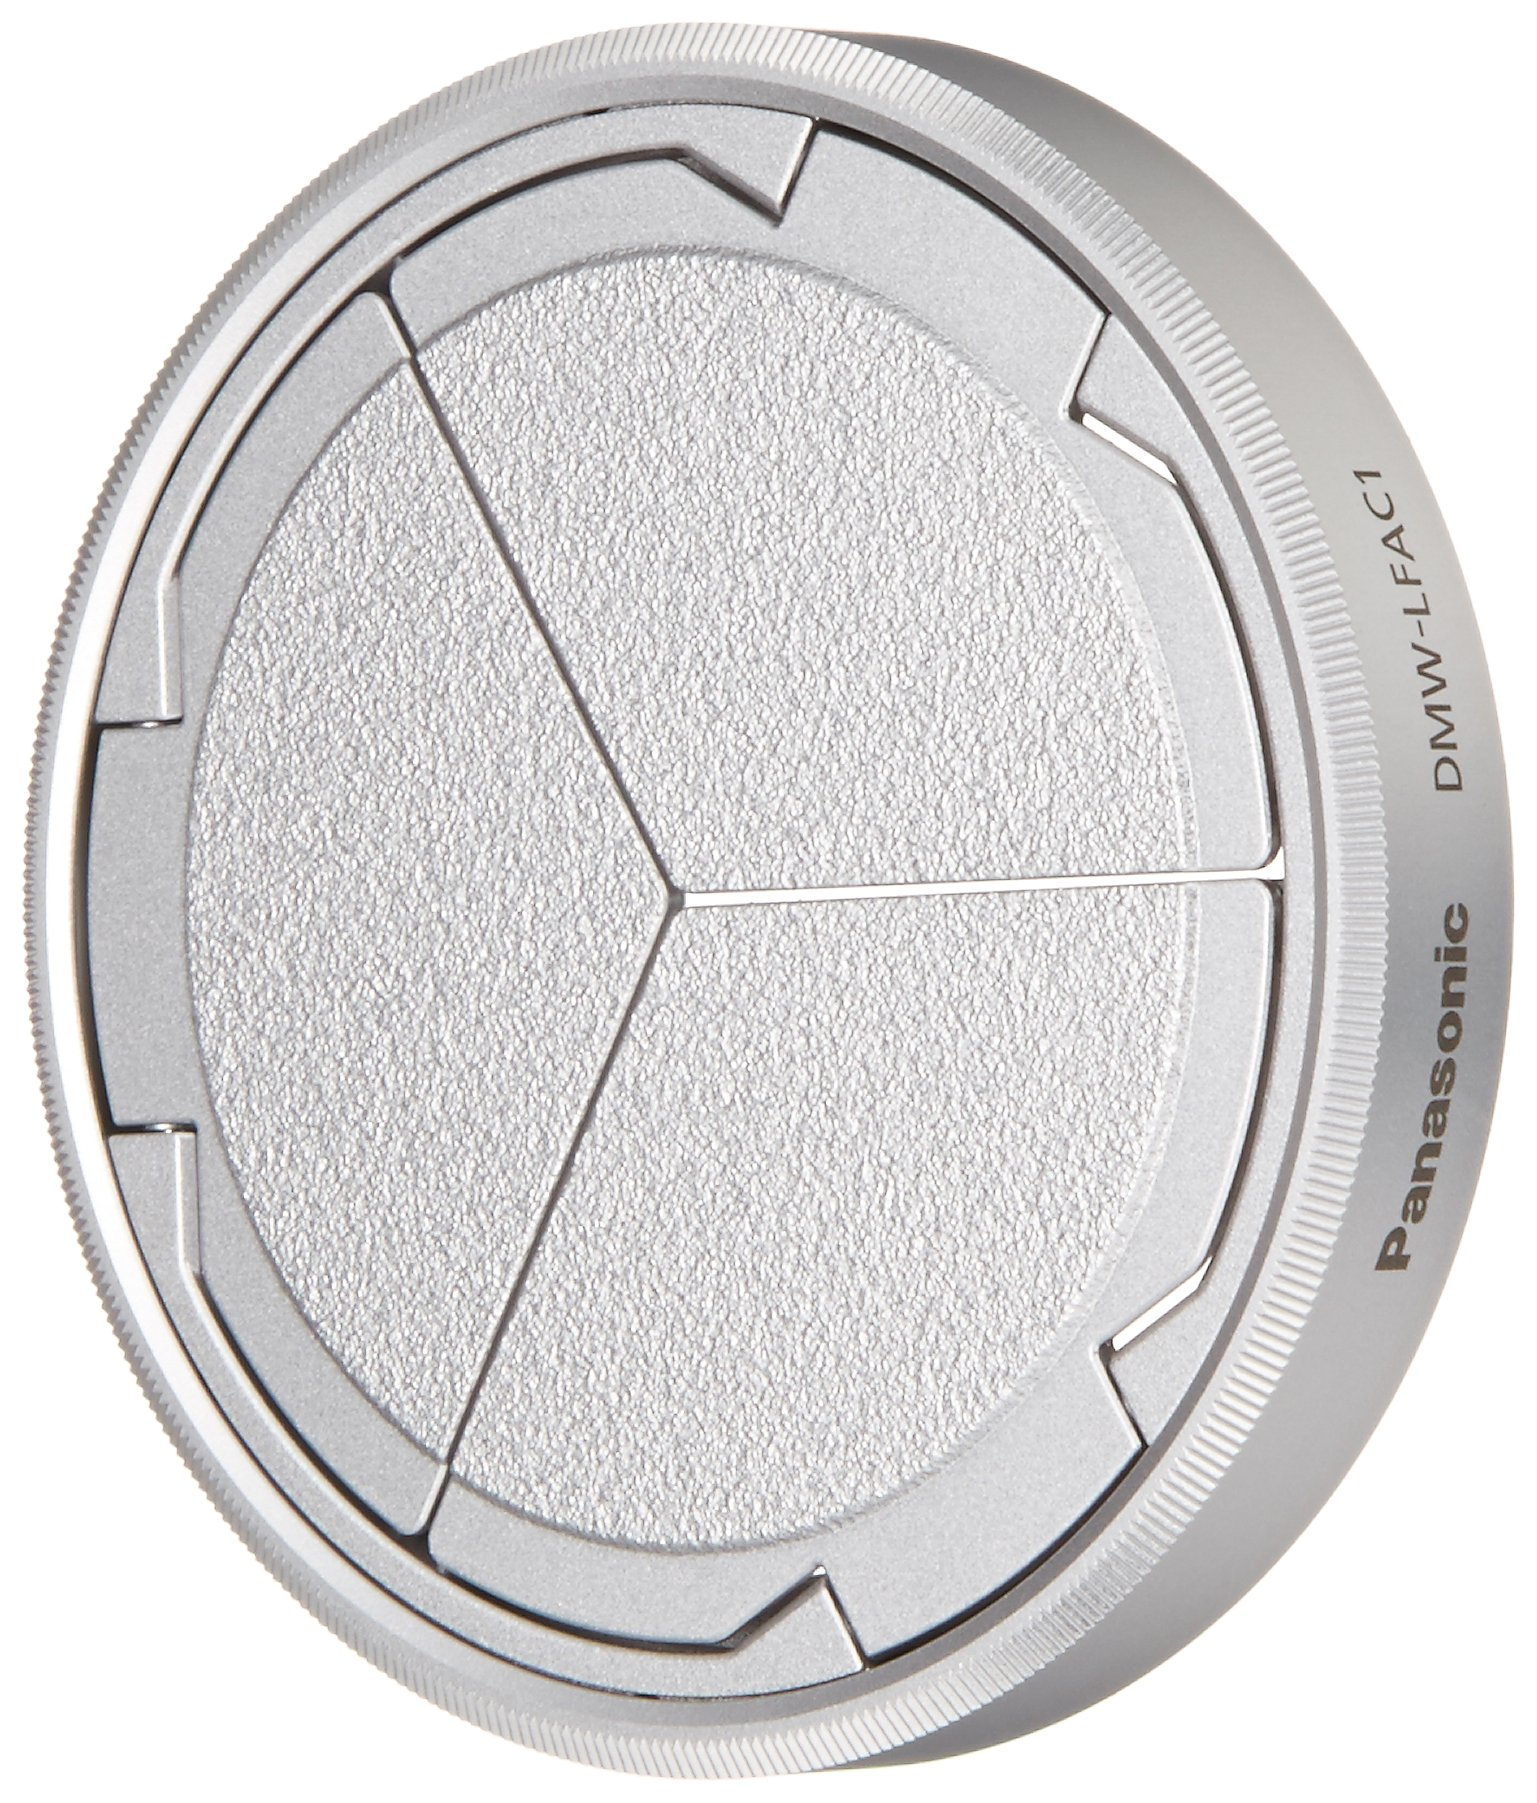 Panasonic DMW-LFAC1S Automatic Lens Cap for Lumix DMC-LX100, Silver